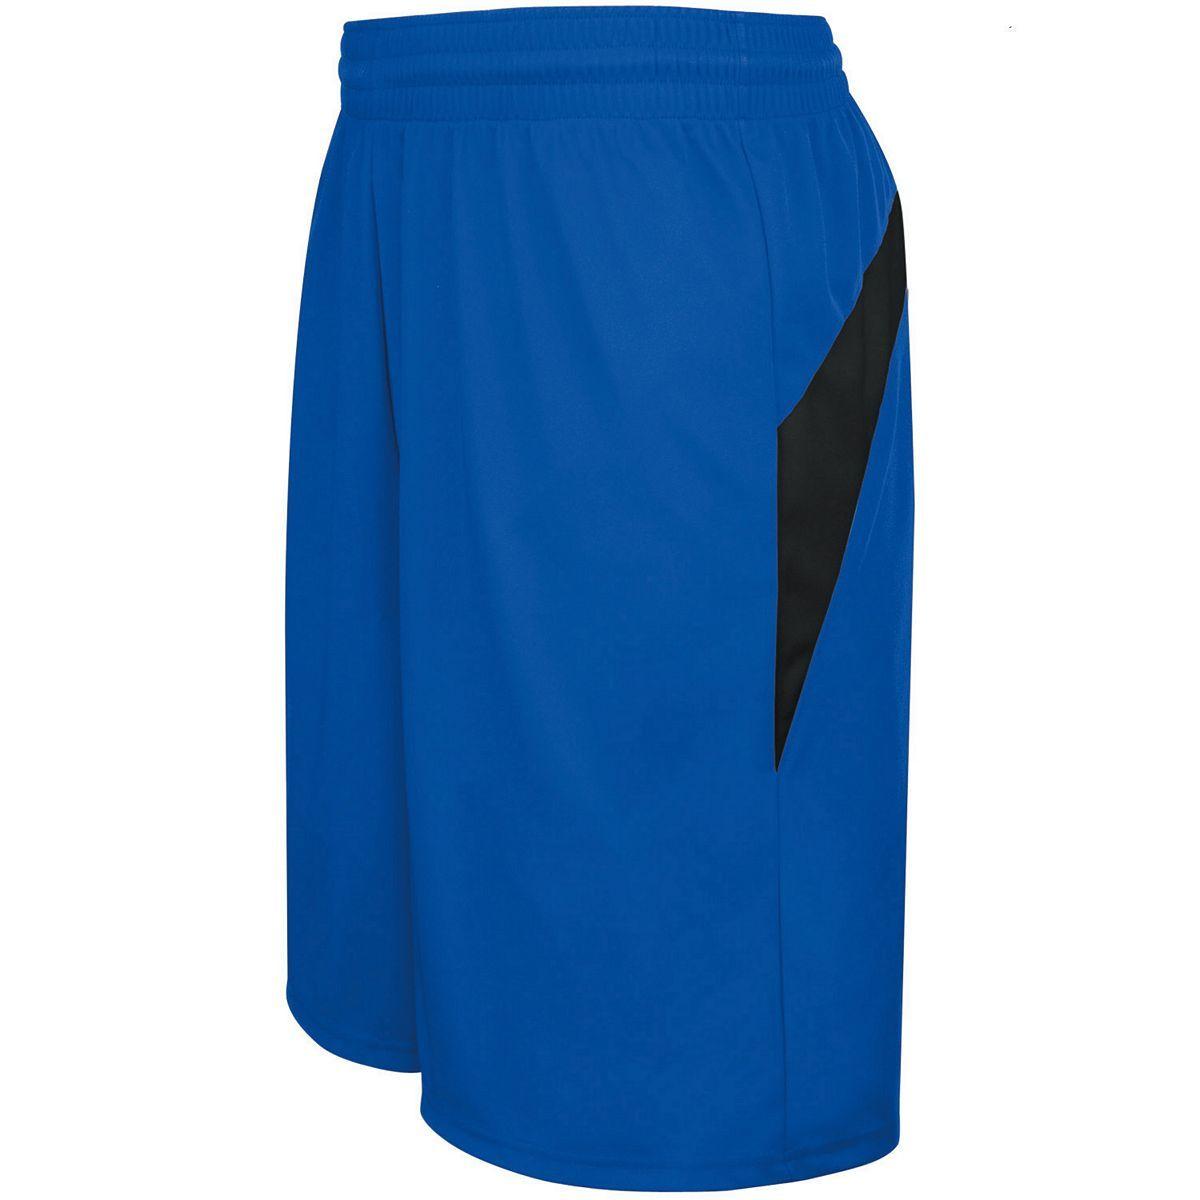 Adult Transition Game Shorts - ROYAL/BLACK